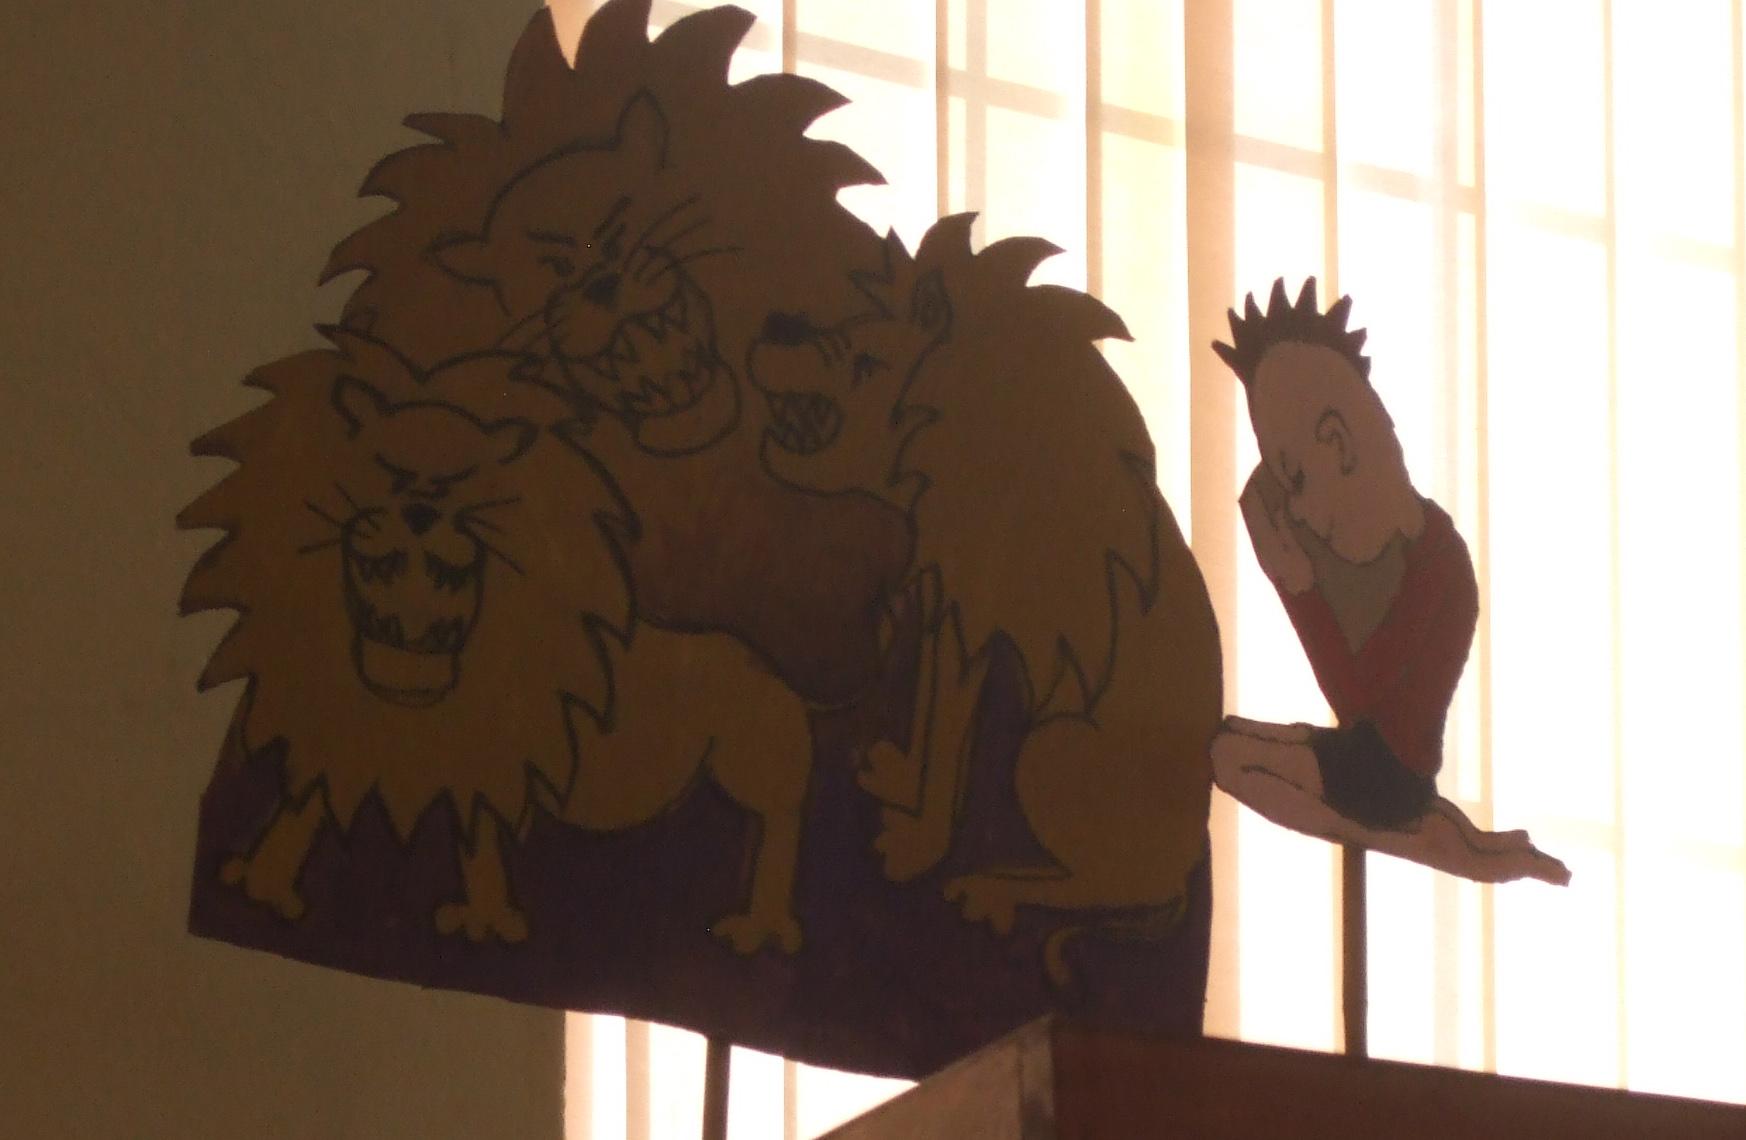 Daniel & the lions puppets